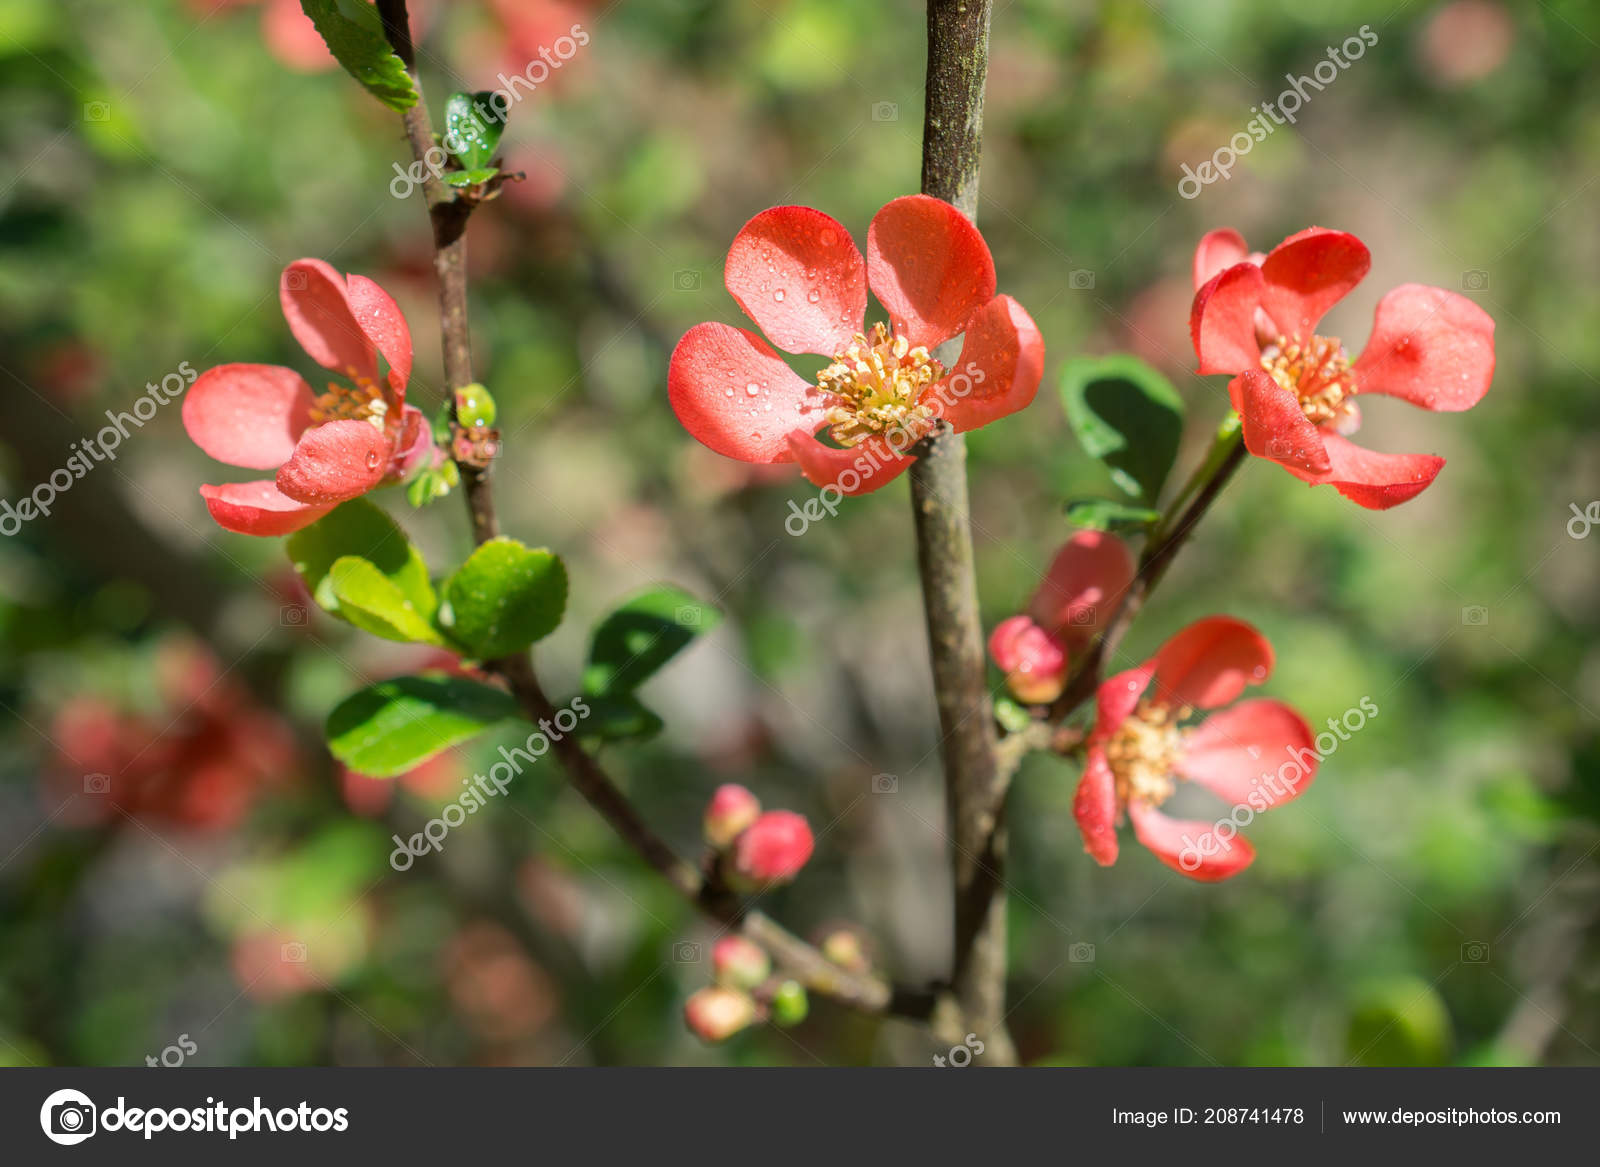 Tree Bloom Blossom Beautiful Flowers Spring Season Stock Photo